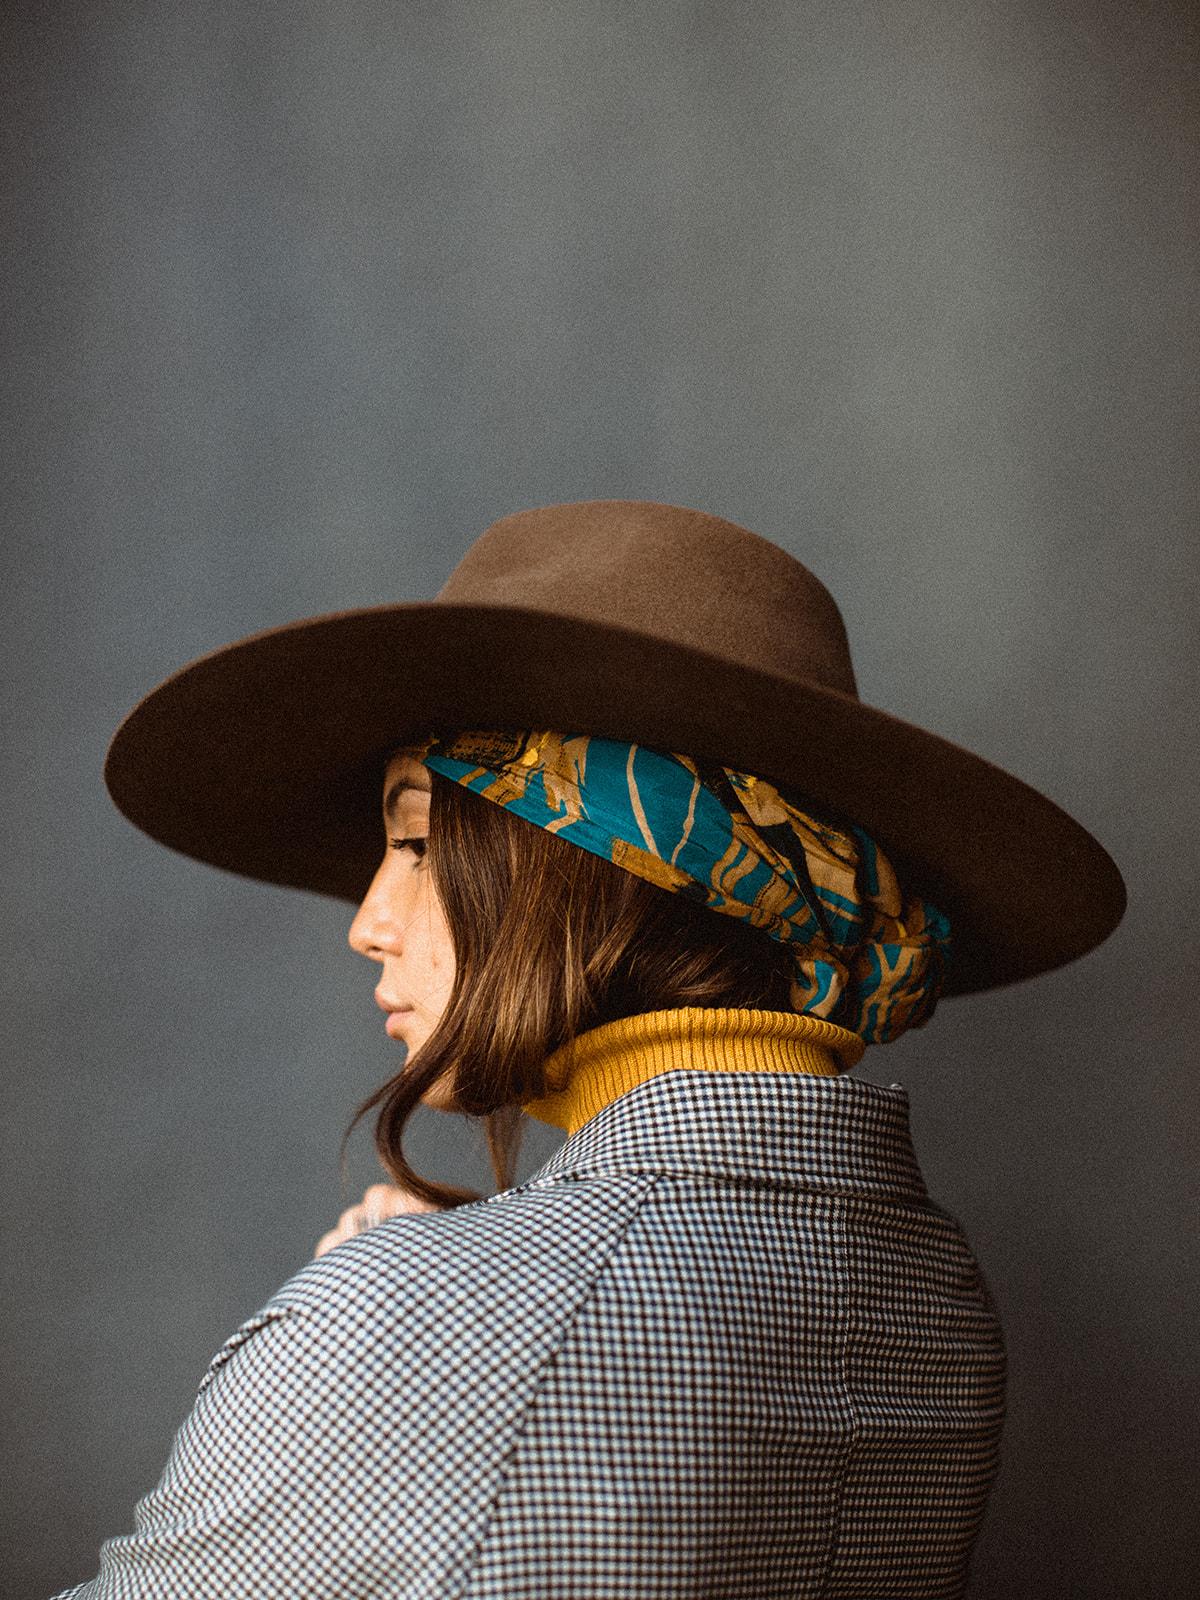 teressa foglia new york city hat designer lookbook-305.jpg